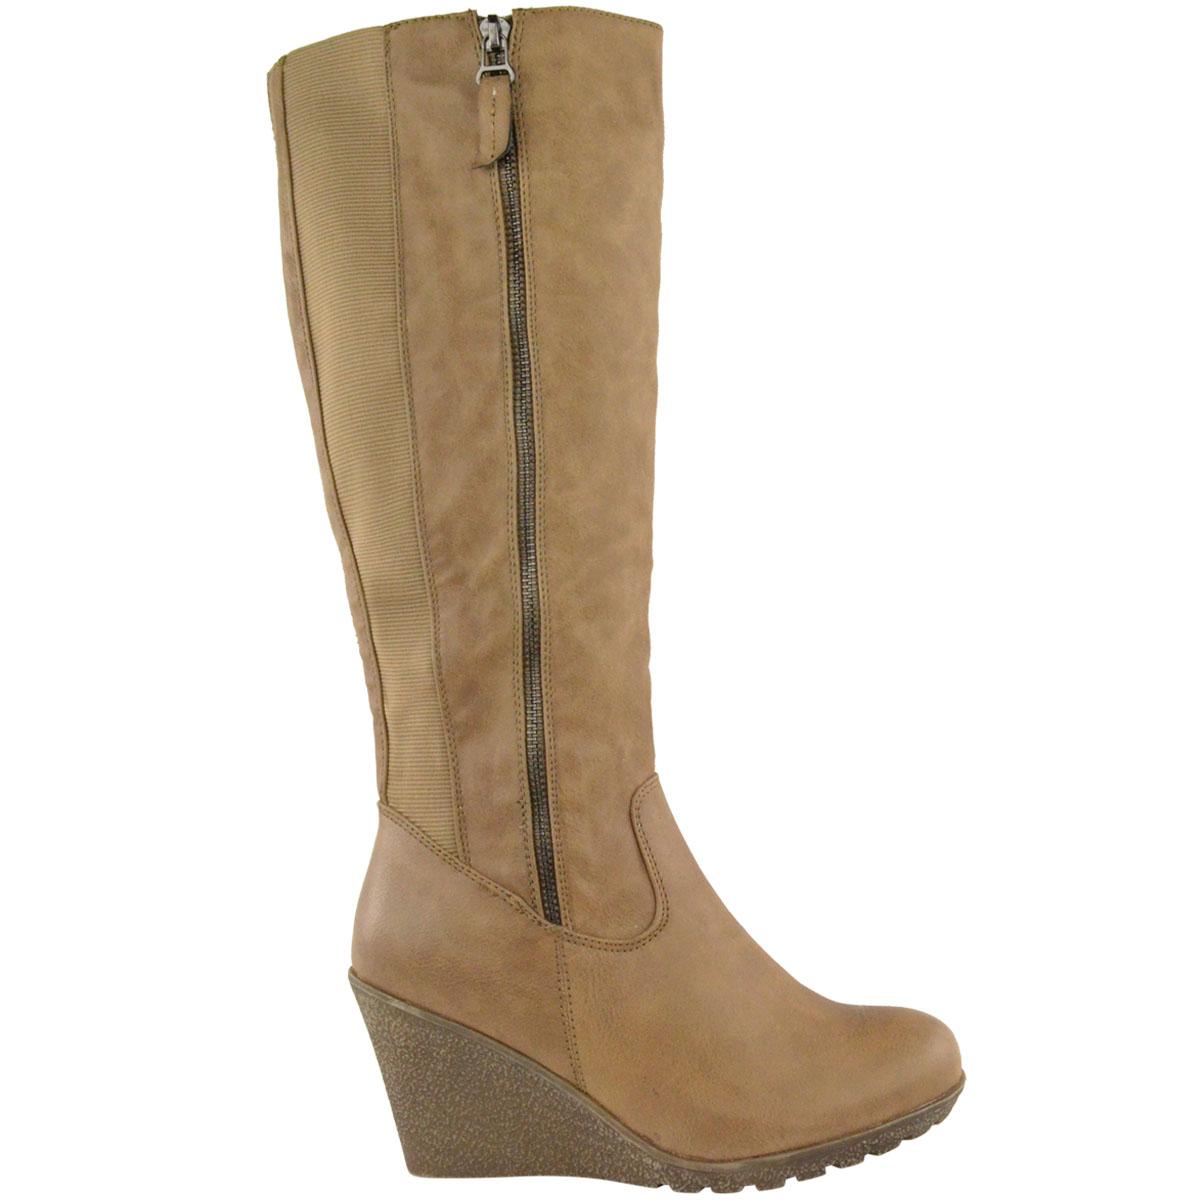 Womens-Ladies-Wedge-Low-Heel-Winter-Knee-Boots-Warm-Faux-Fur-Fleece-Size-UK thumbnail 17